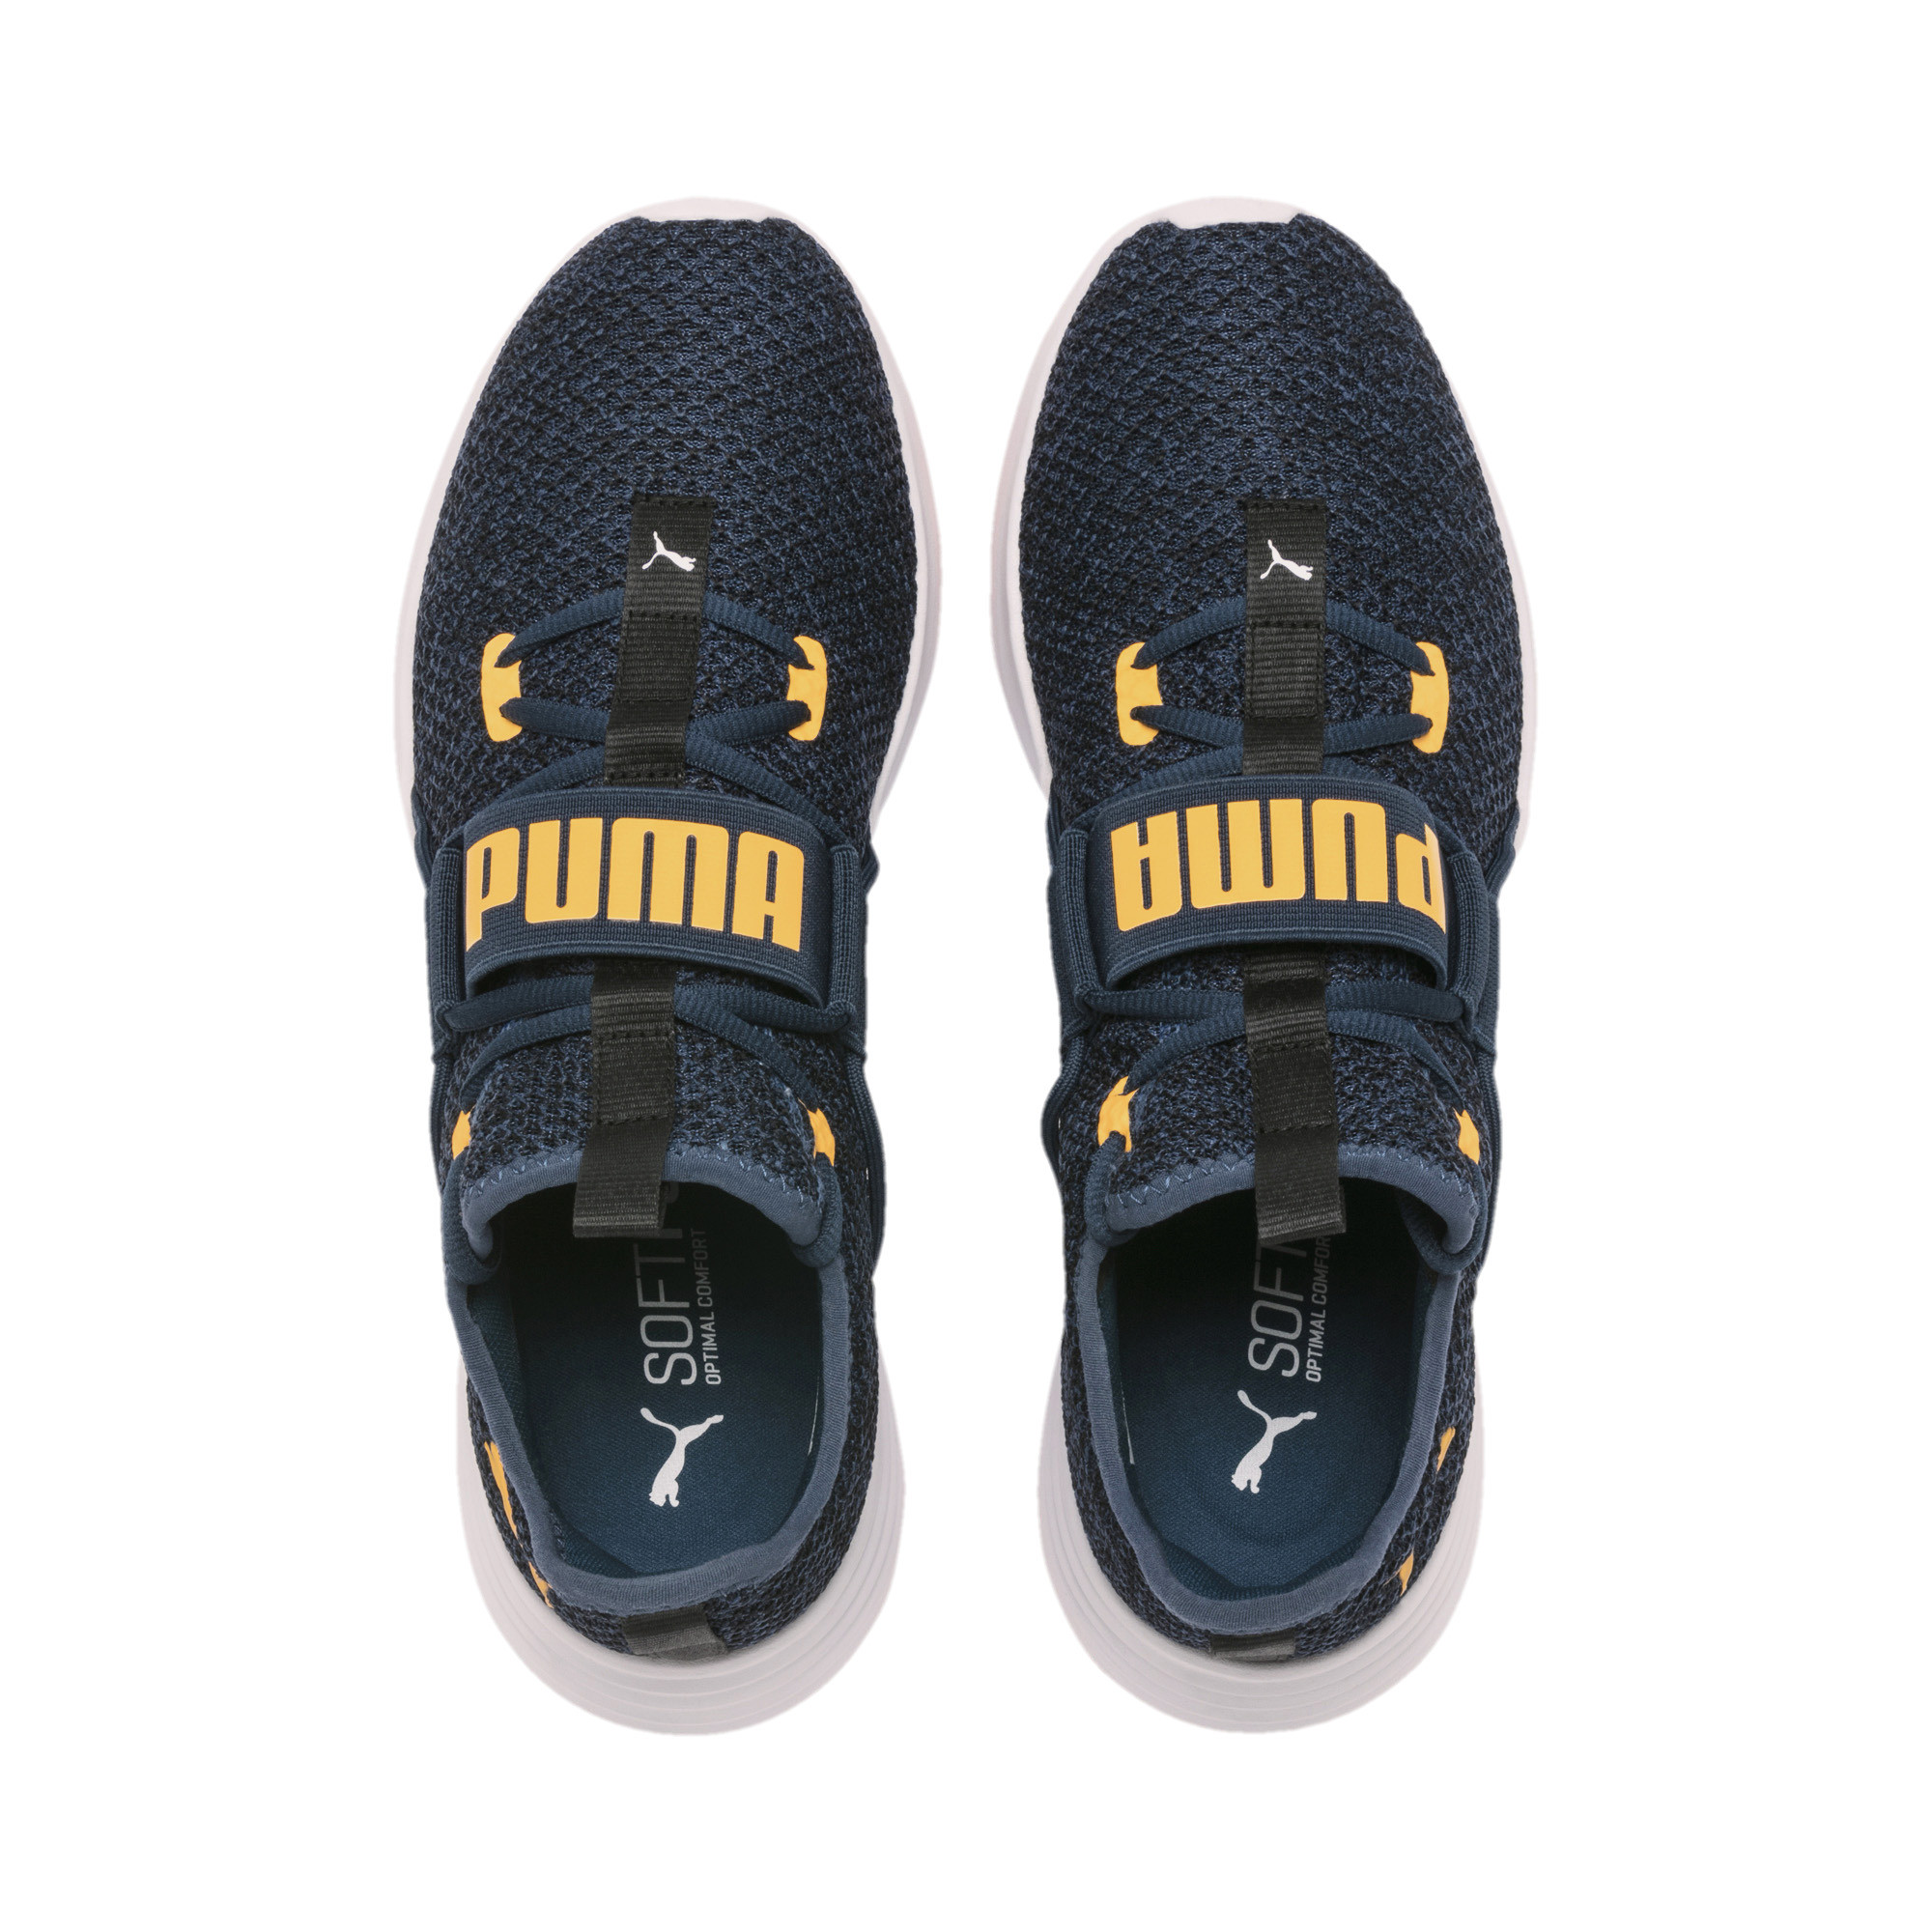 PUMA-Men-039-s-Persist-XT-Knit-Training-Shoes thumbnail 22